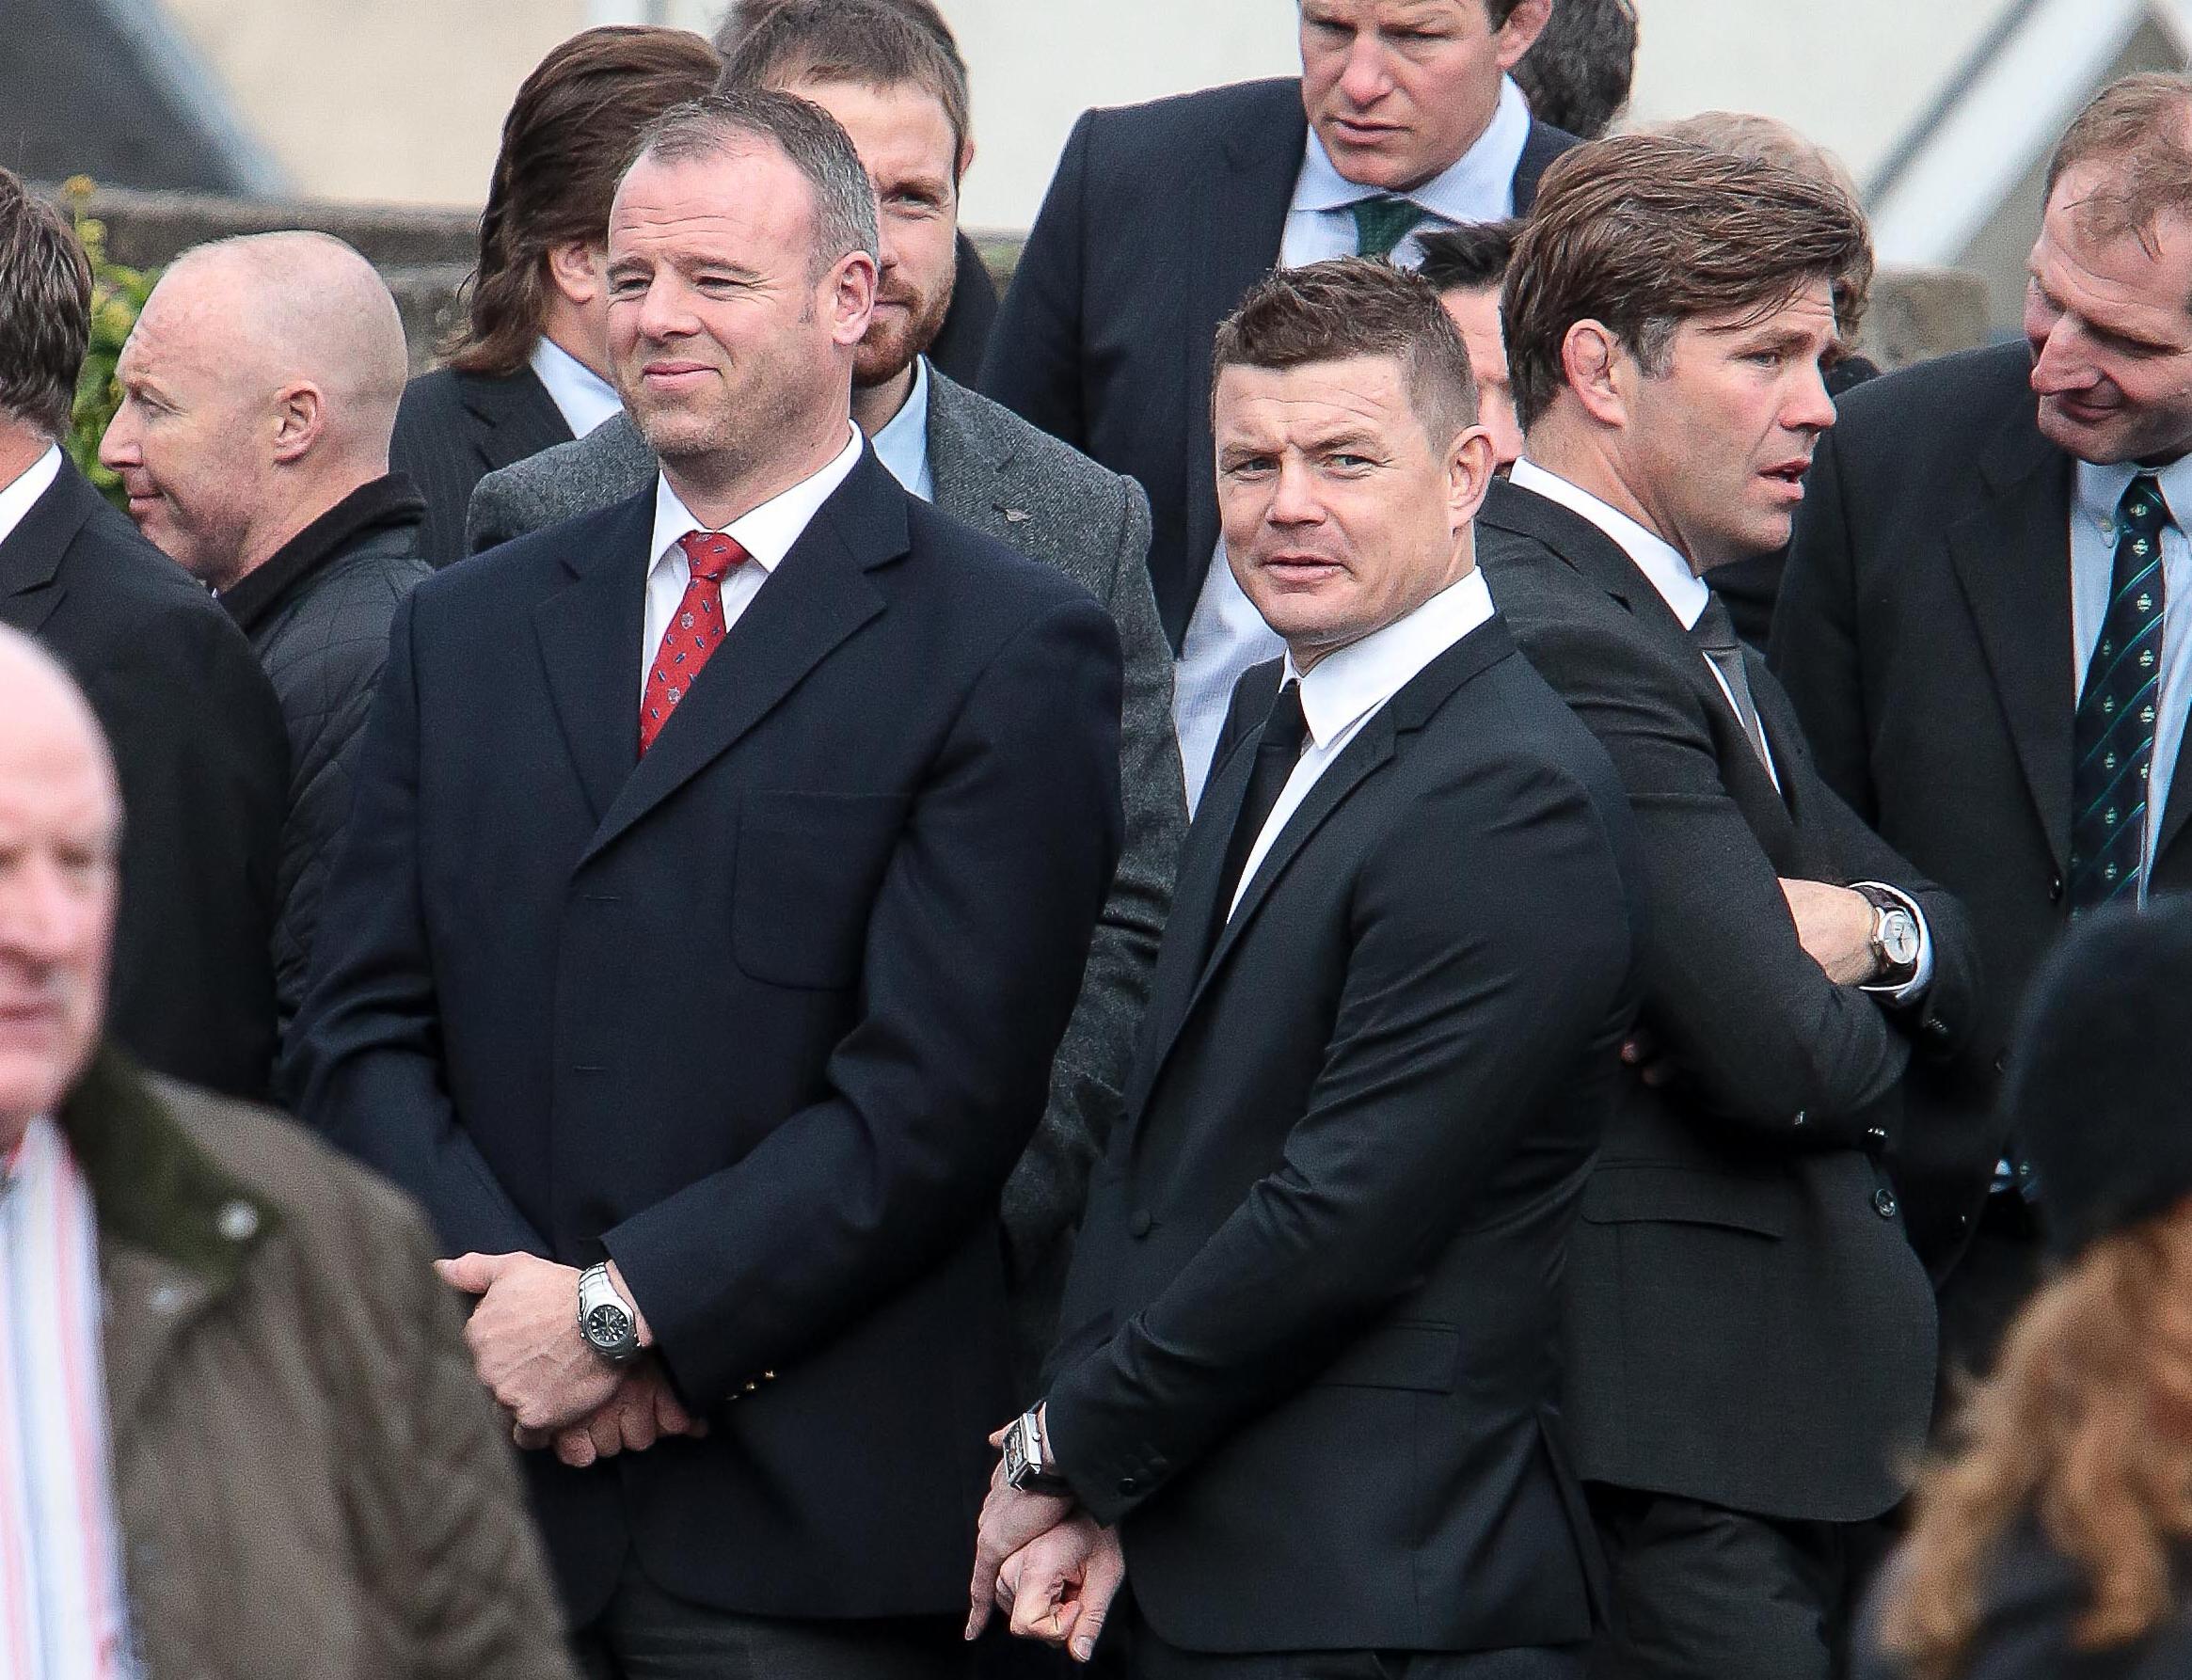 Rugby - Le dernier hommage du rugby irlandais à Anthony Foley